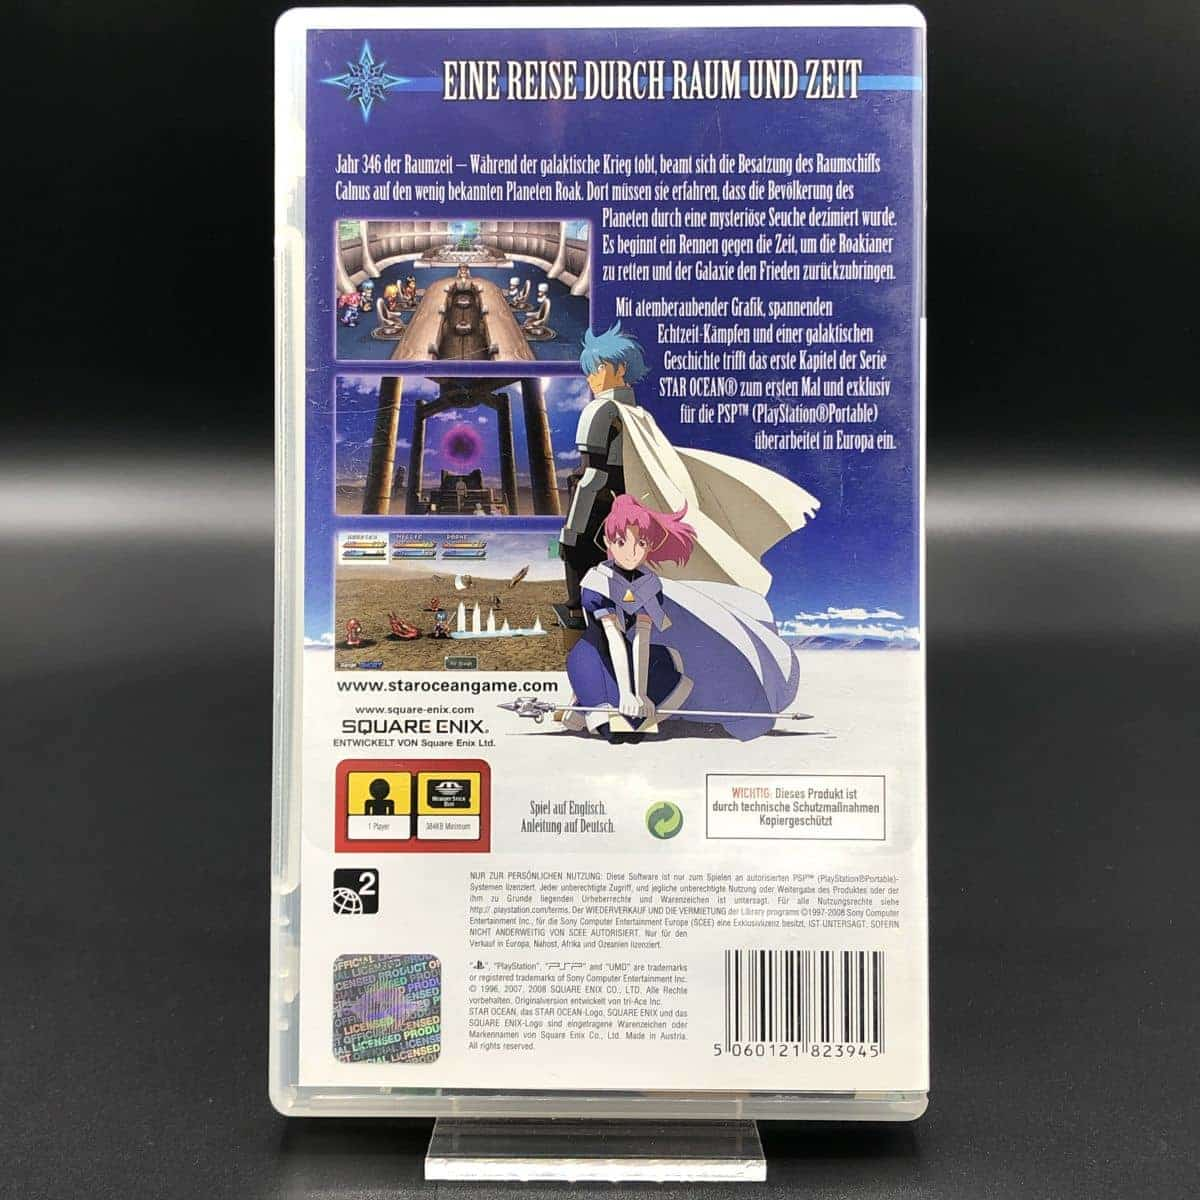 PSP Star Ocean: First Departure (Komplett) (Sehr gut) Sony PlayStation Portable